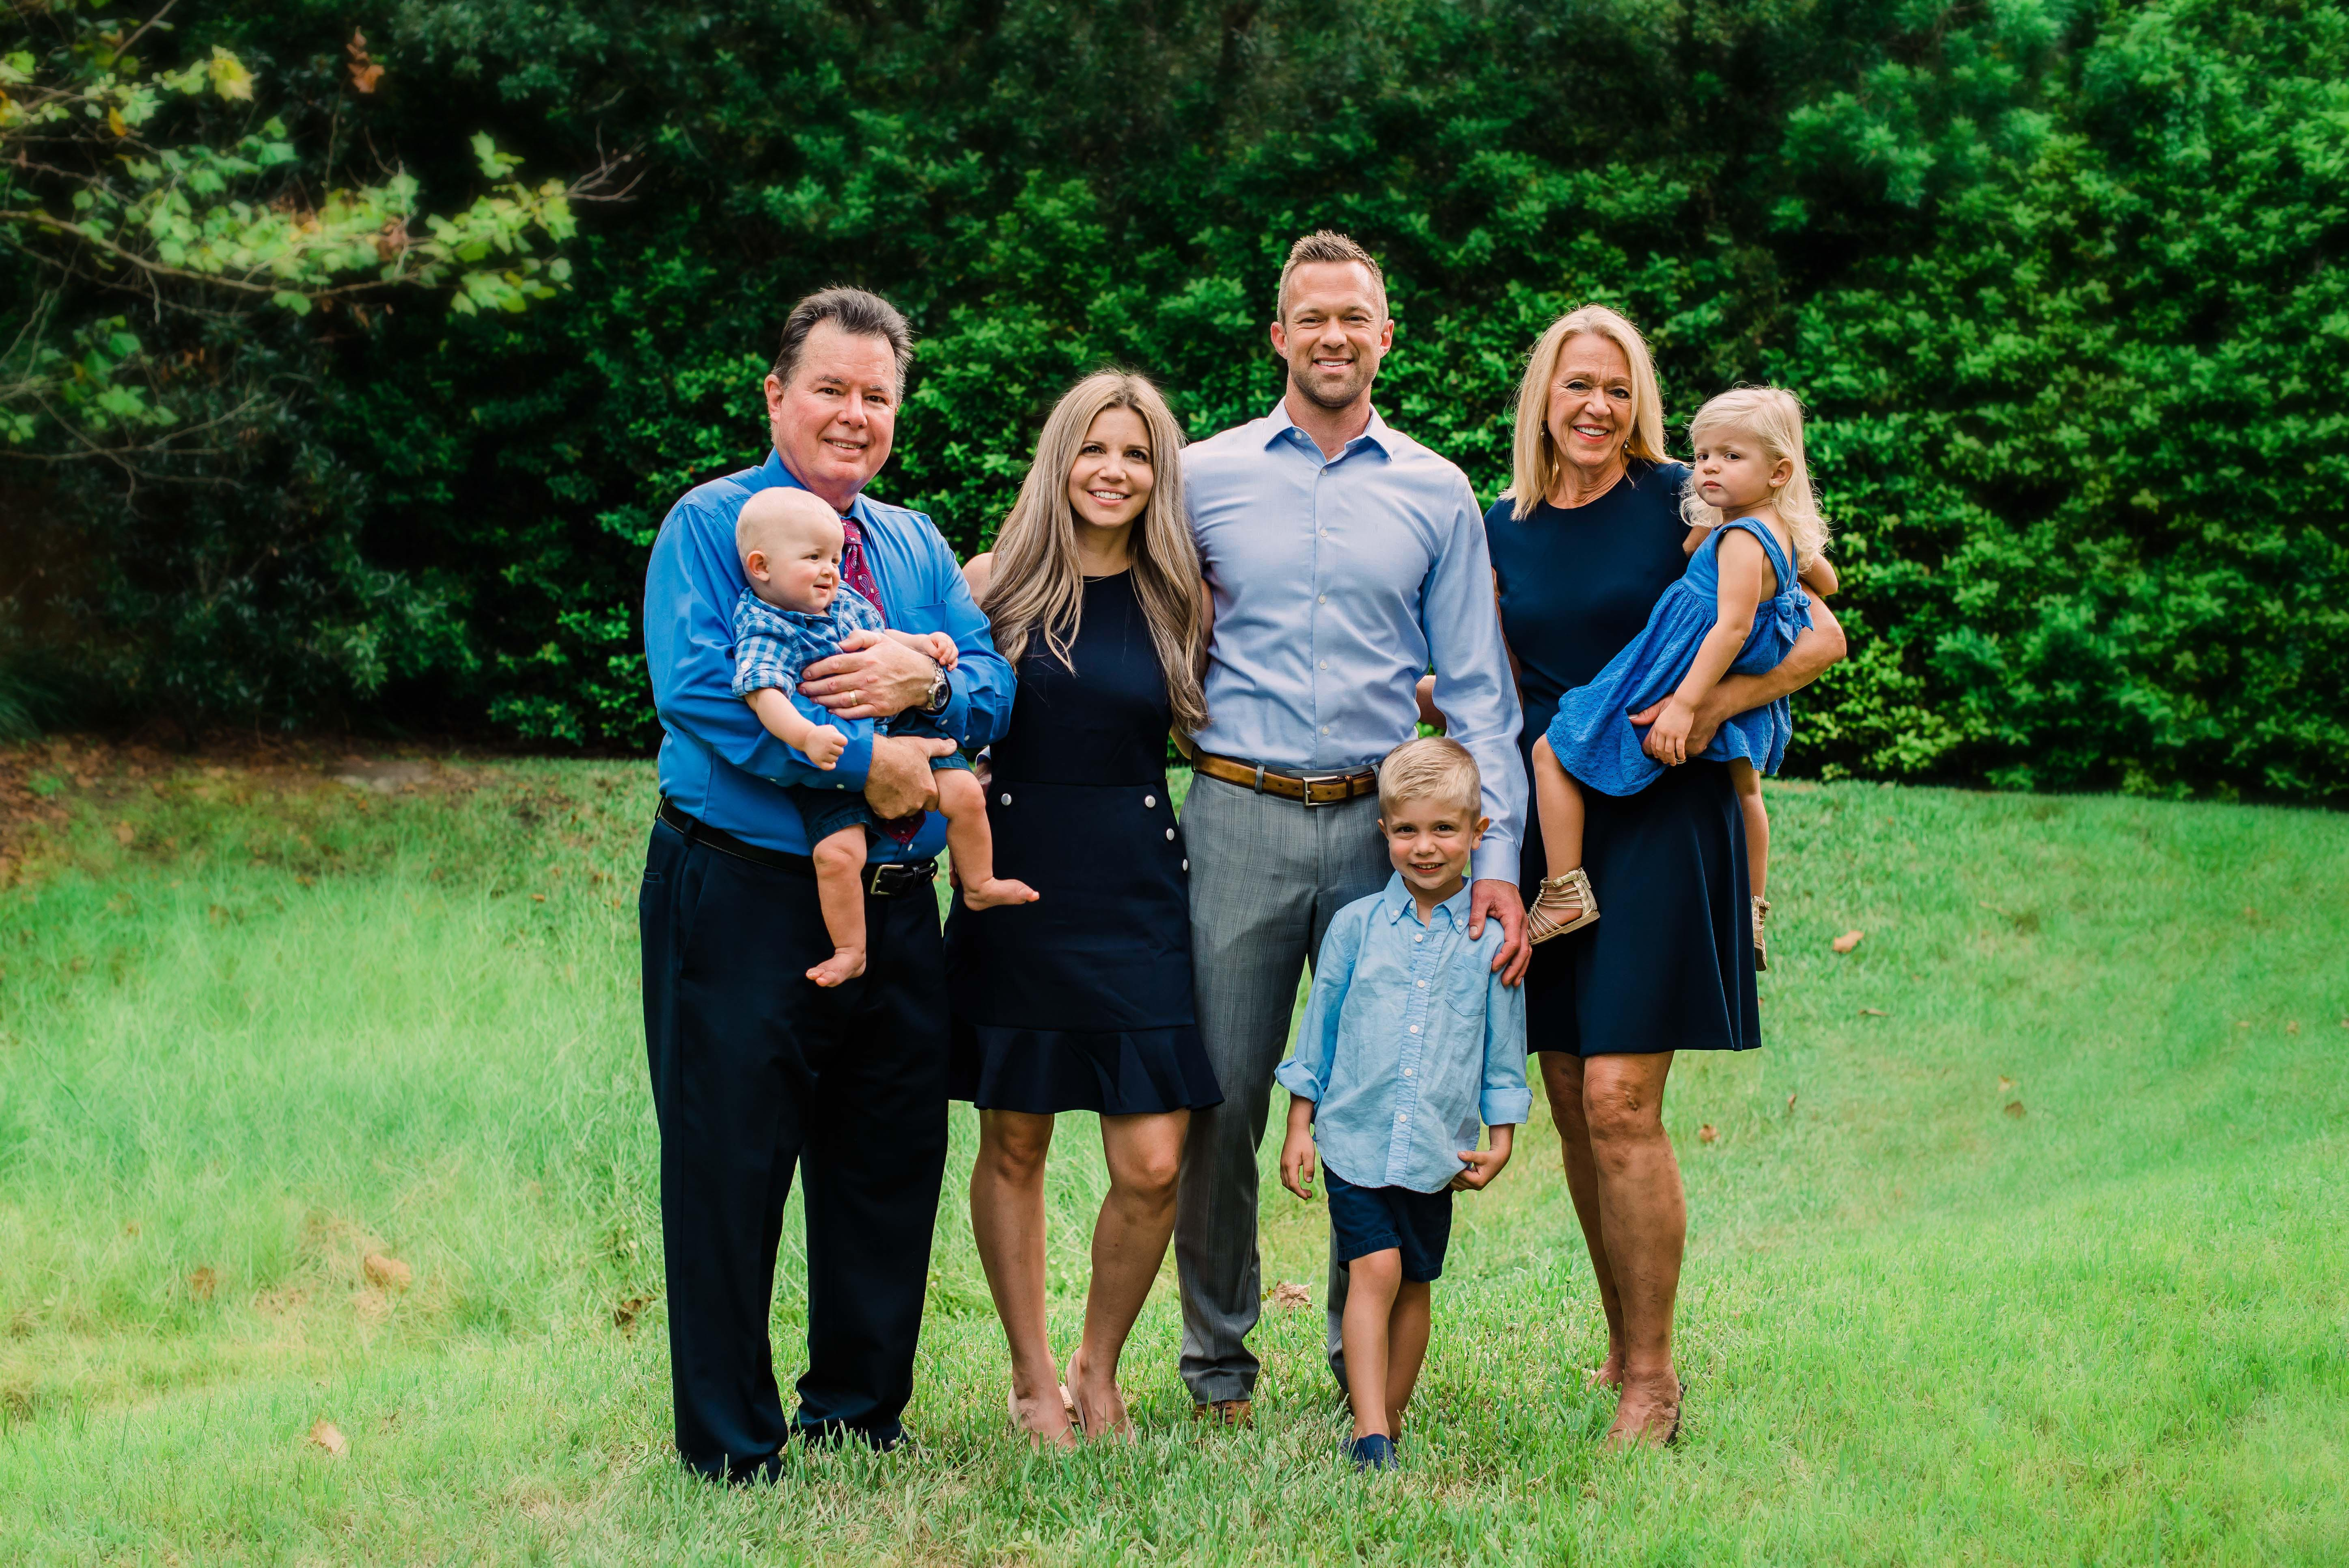 Paul C. Morgan Agency: Allstate Insurance